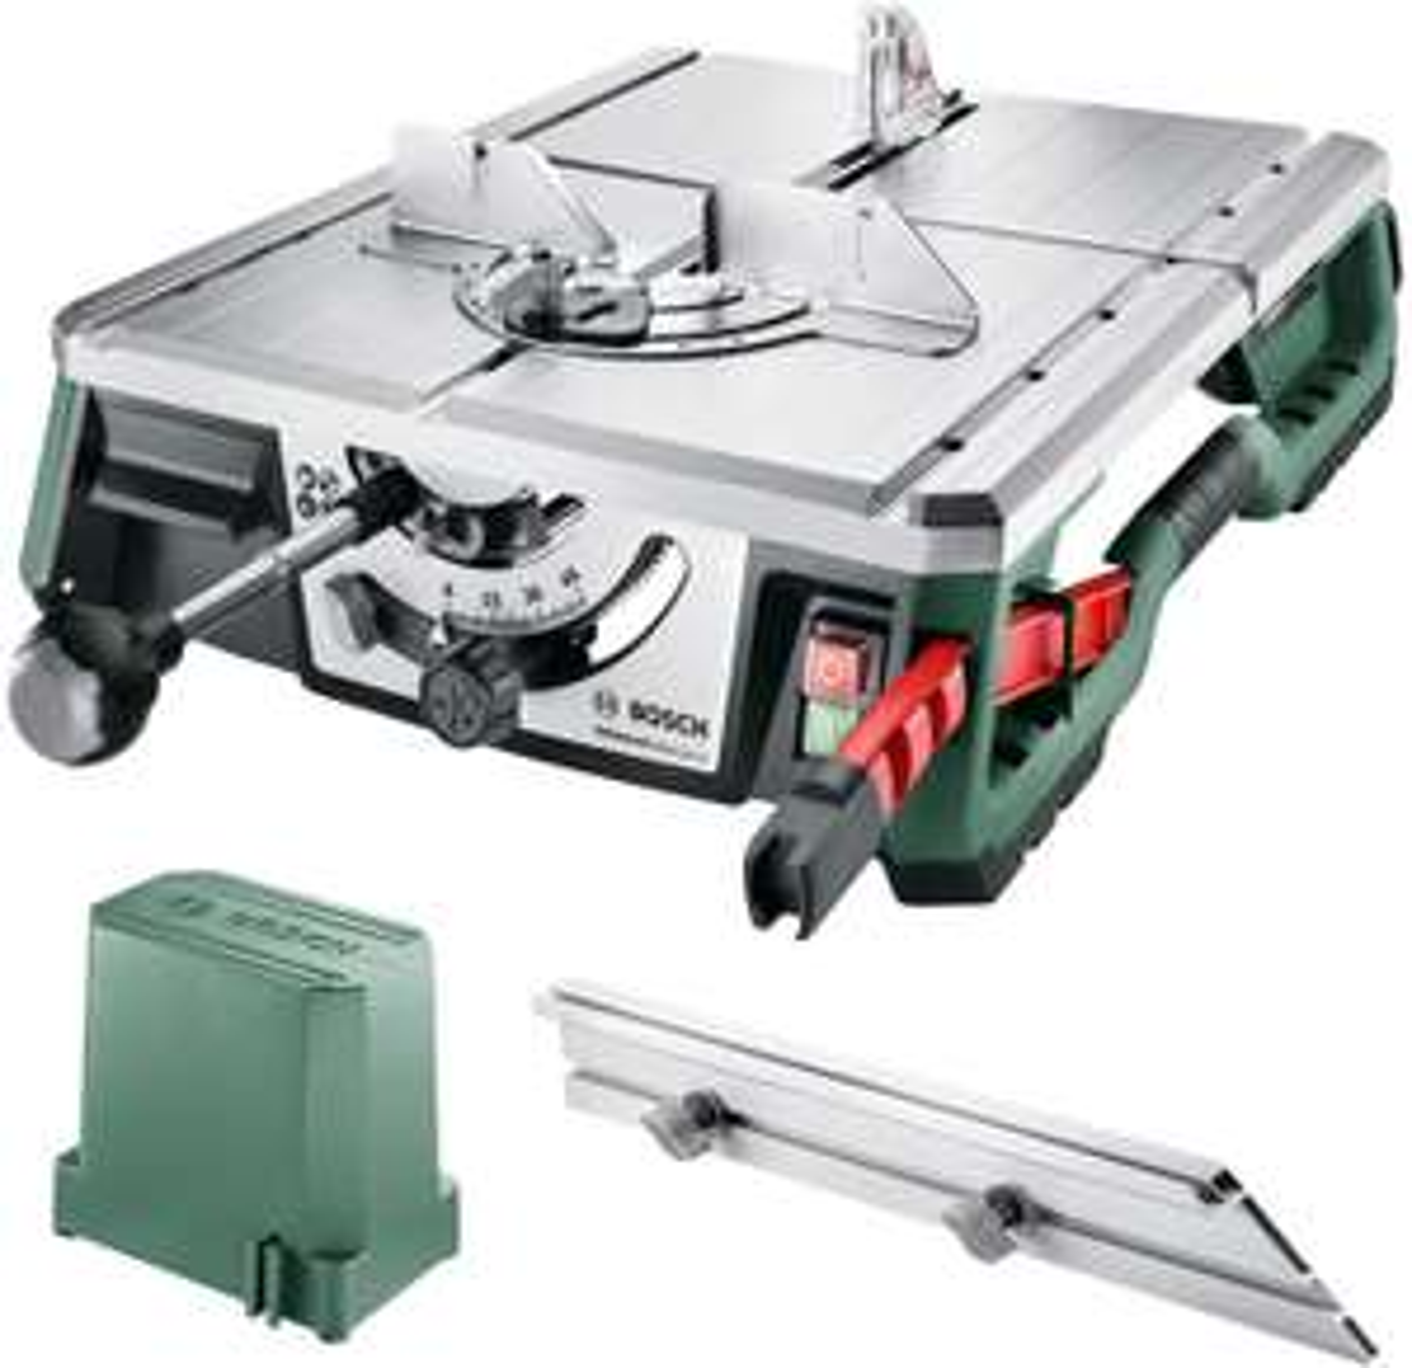 Bosch AdvancedTableCut 52 zaagtafel